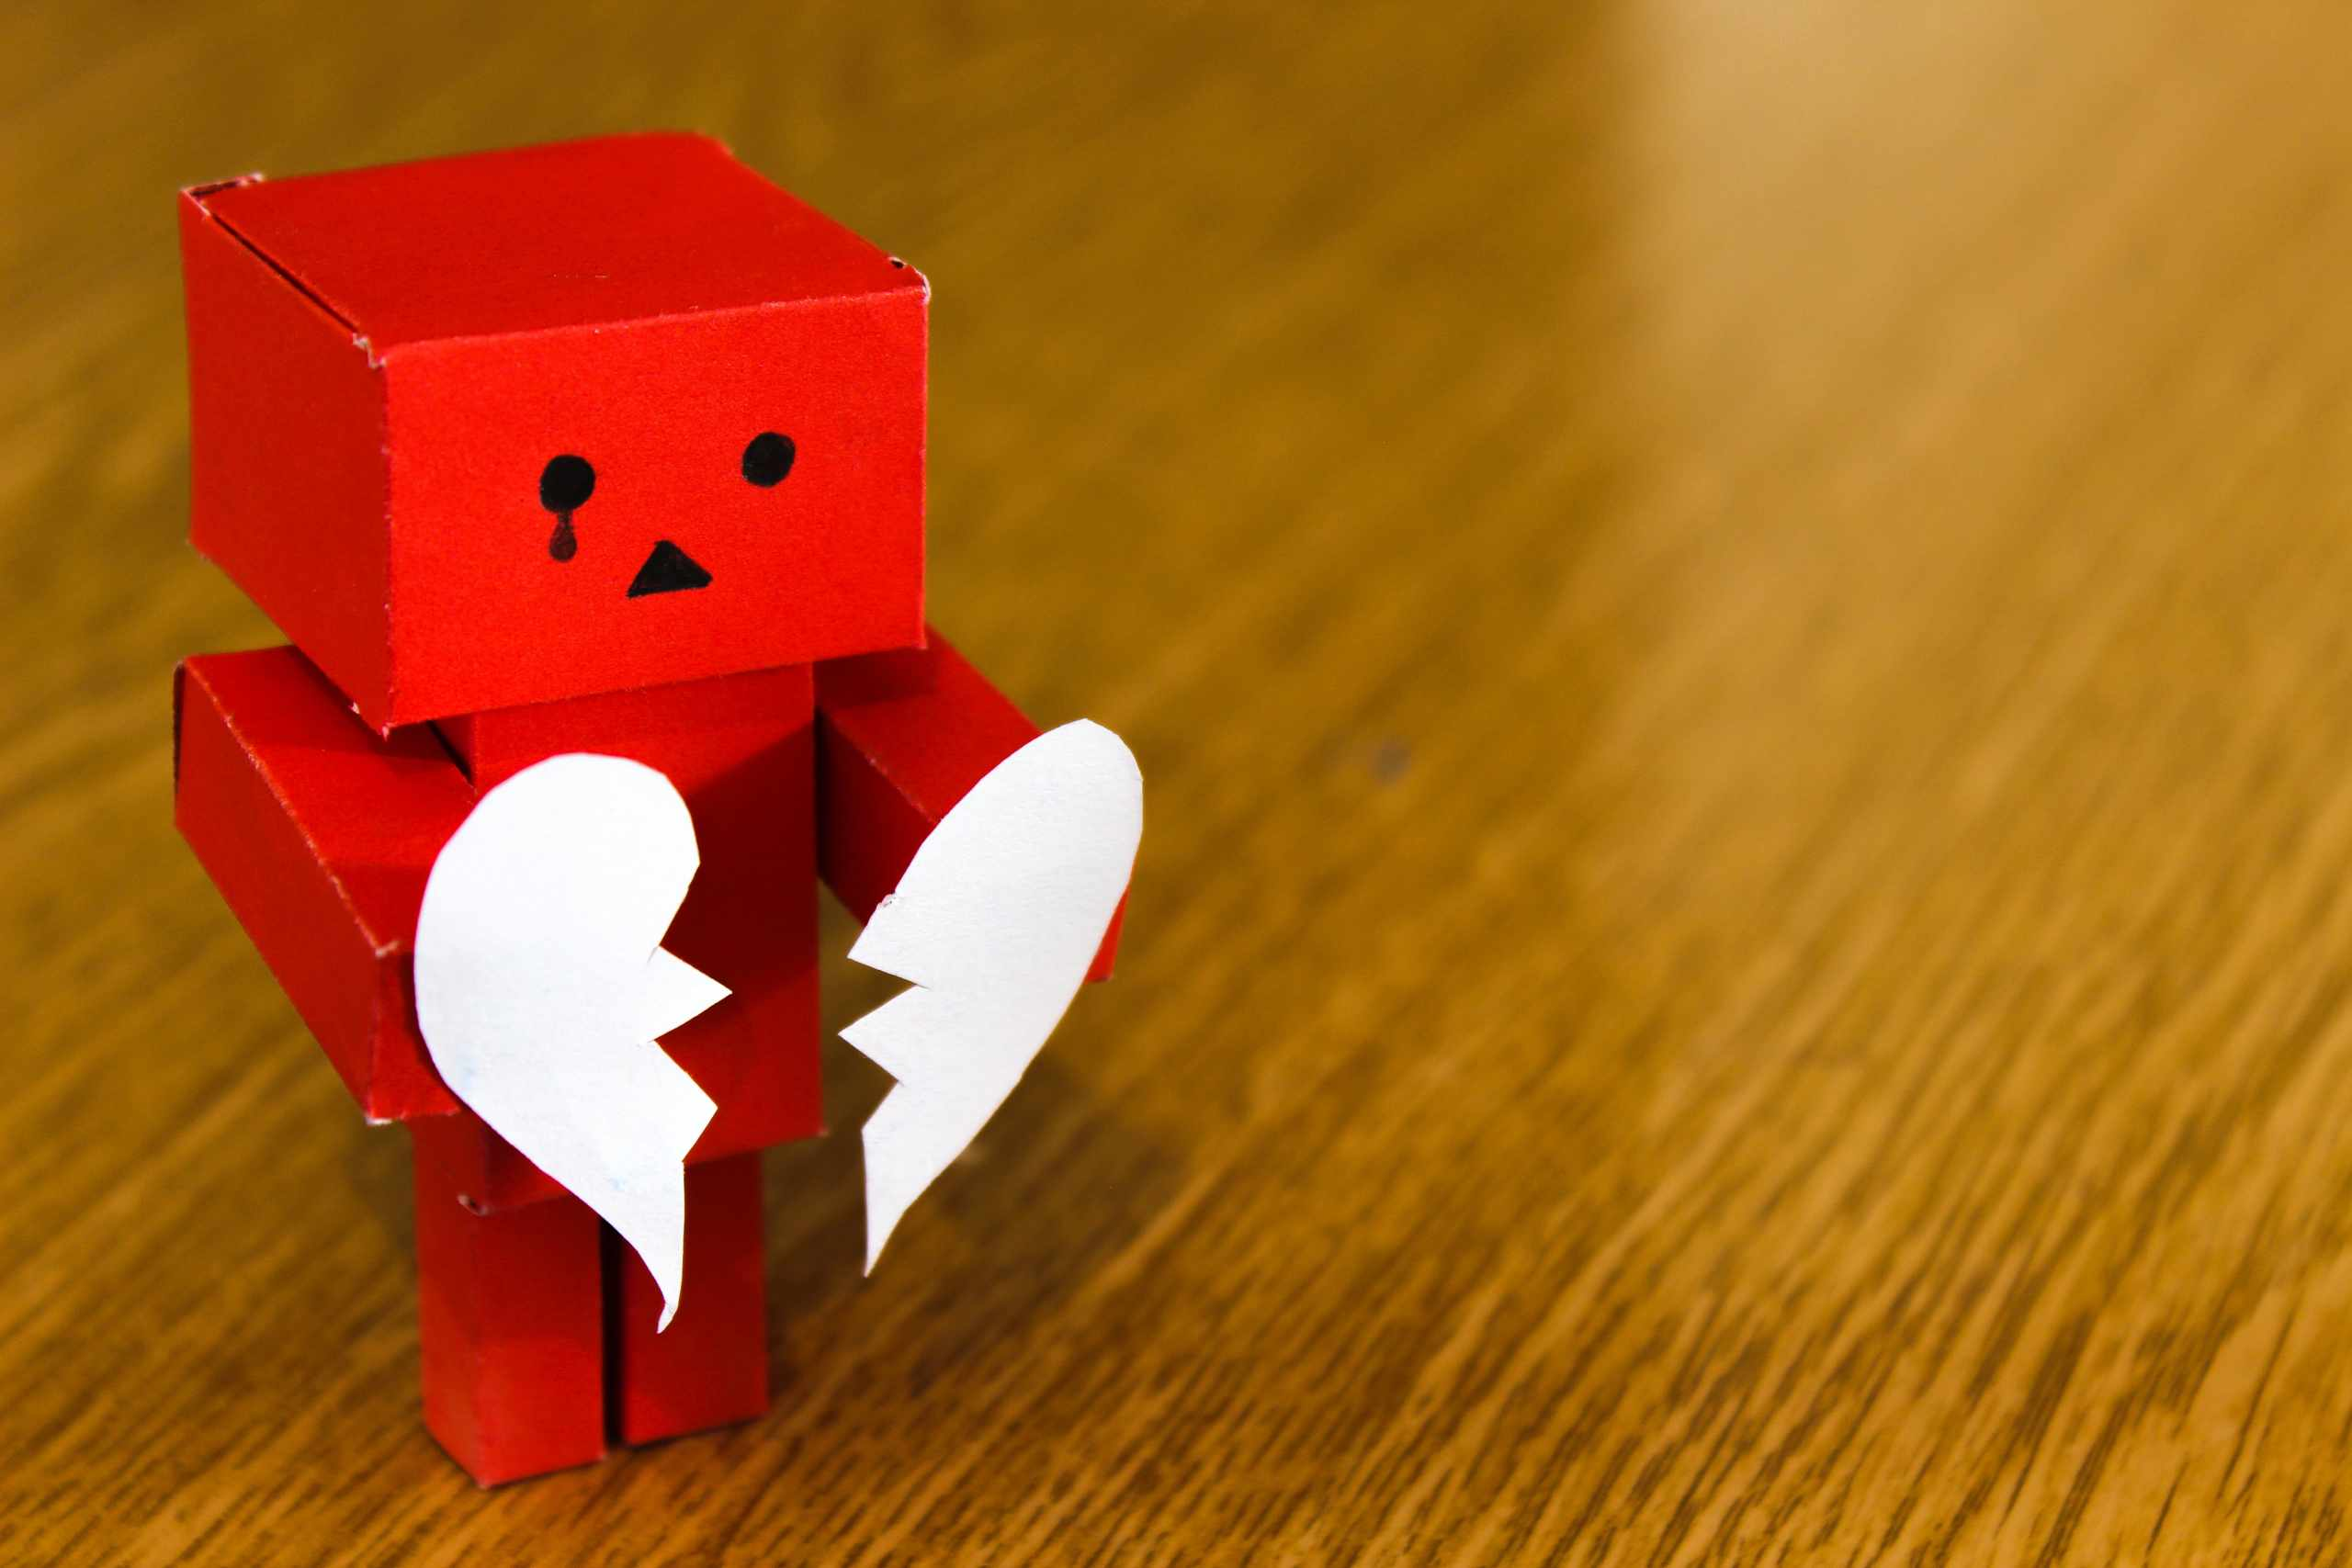 Breakups are common